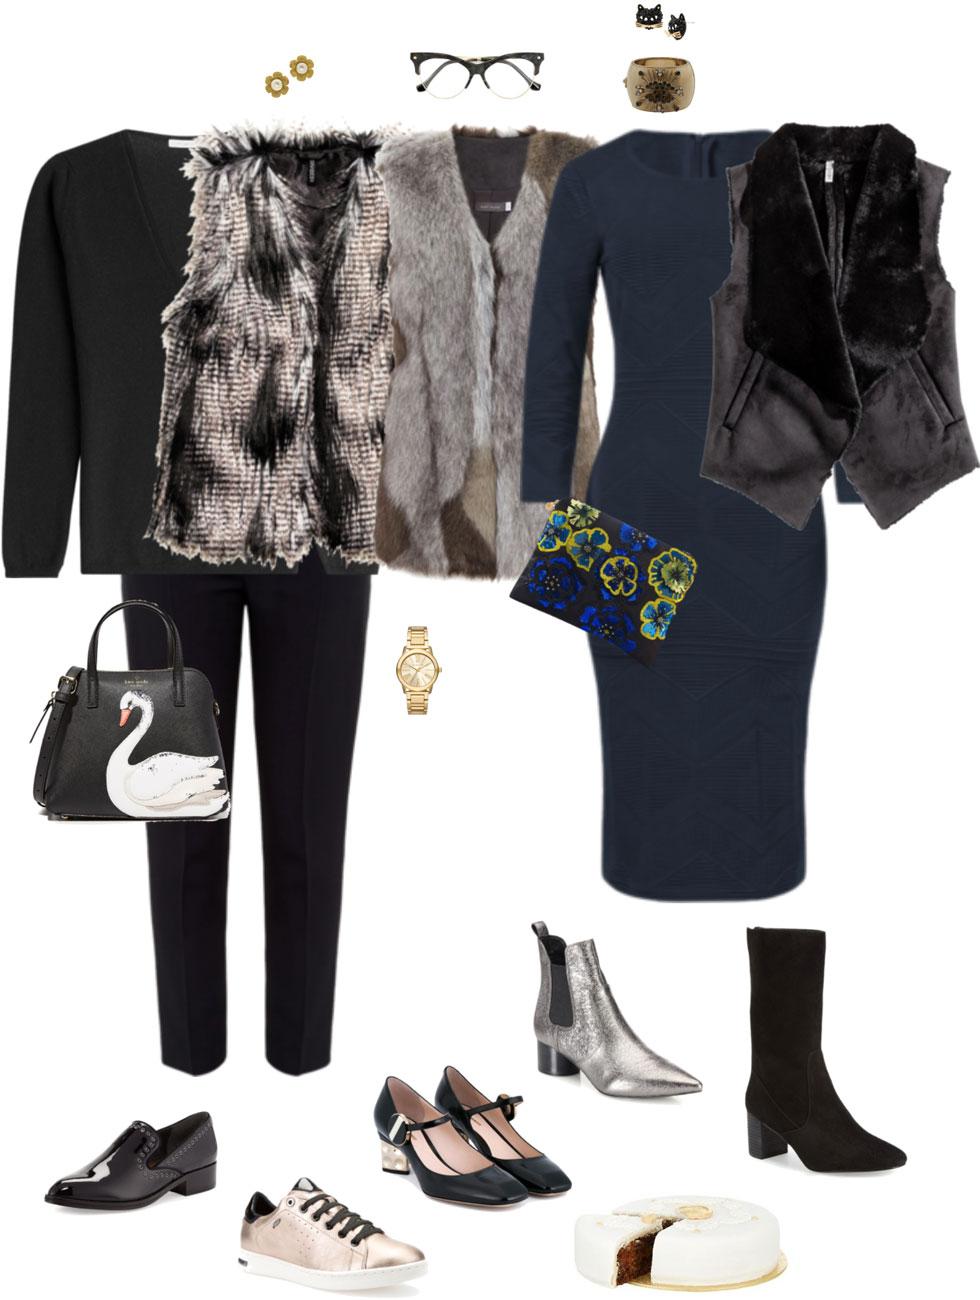 Ensemble Style Advice - Holiday Ensemble: Easy Faux Fur Vest